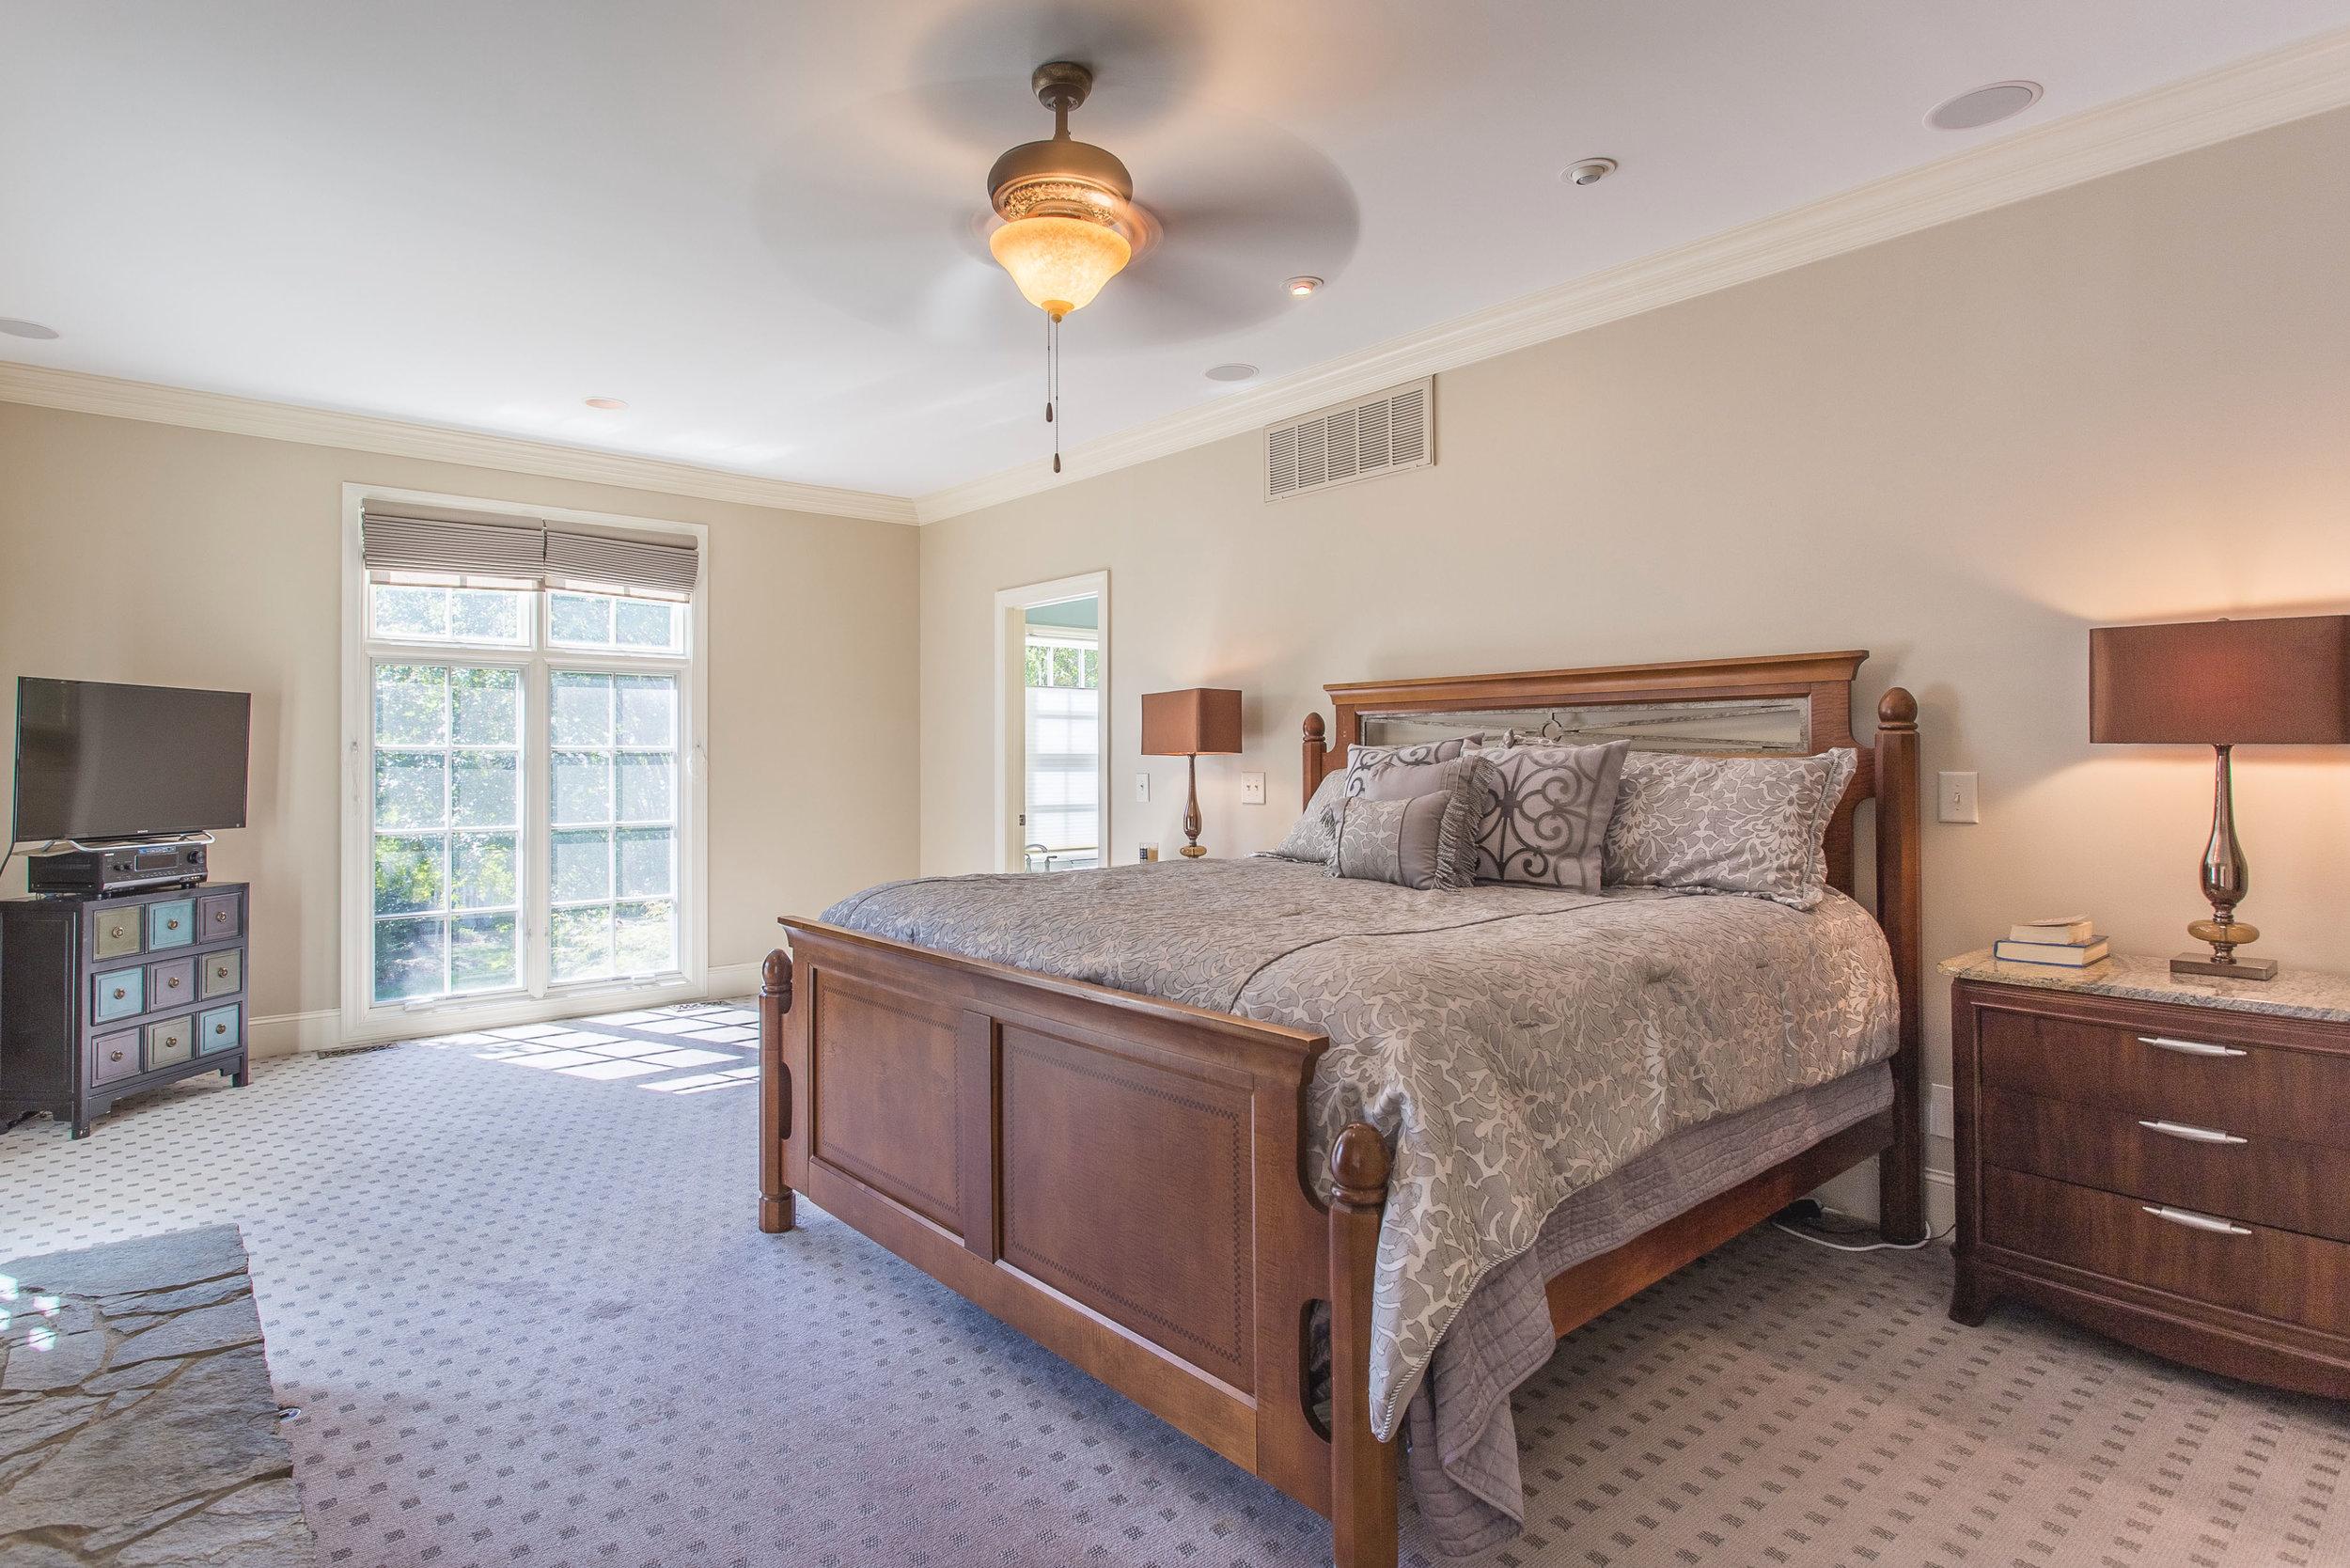 greensboro-real-estate-photography-high-point-kernersville-north-carolina-photographer-burlington-architectural.jpg